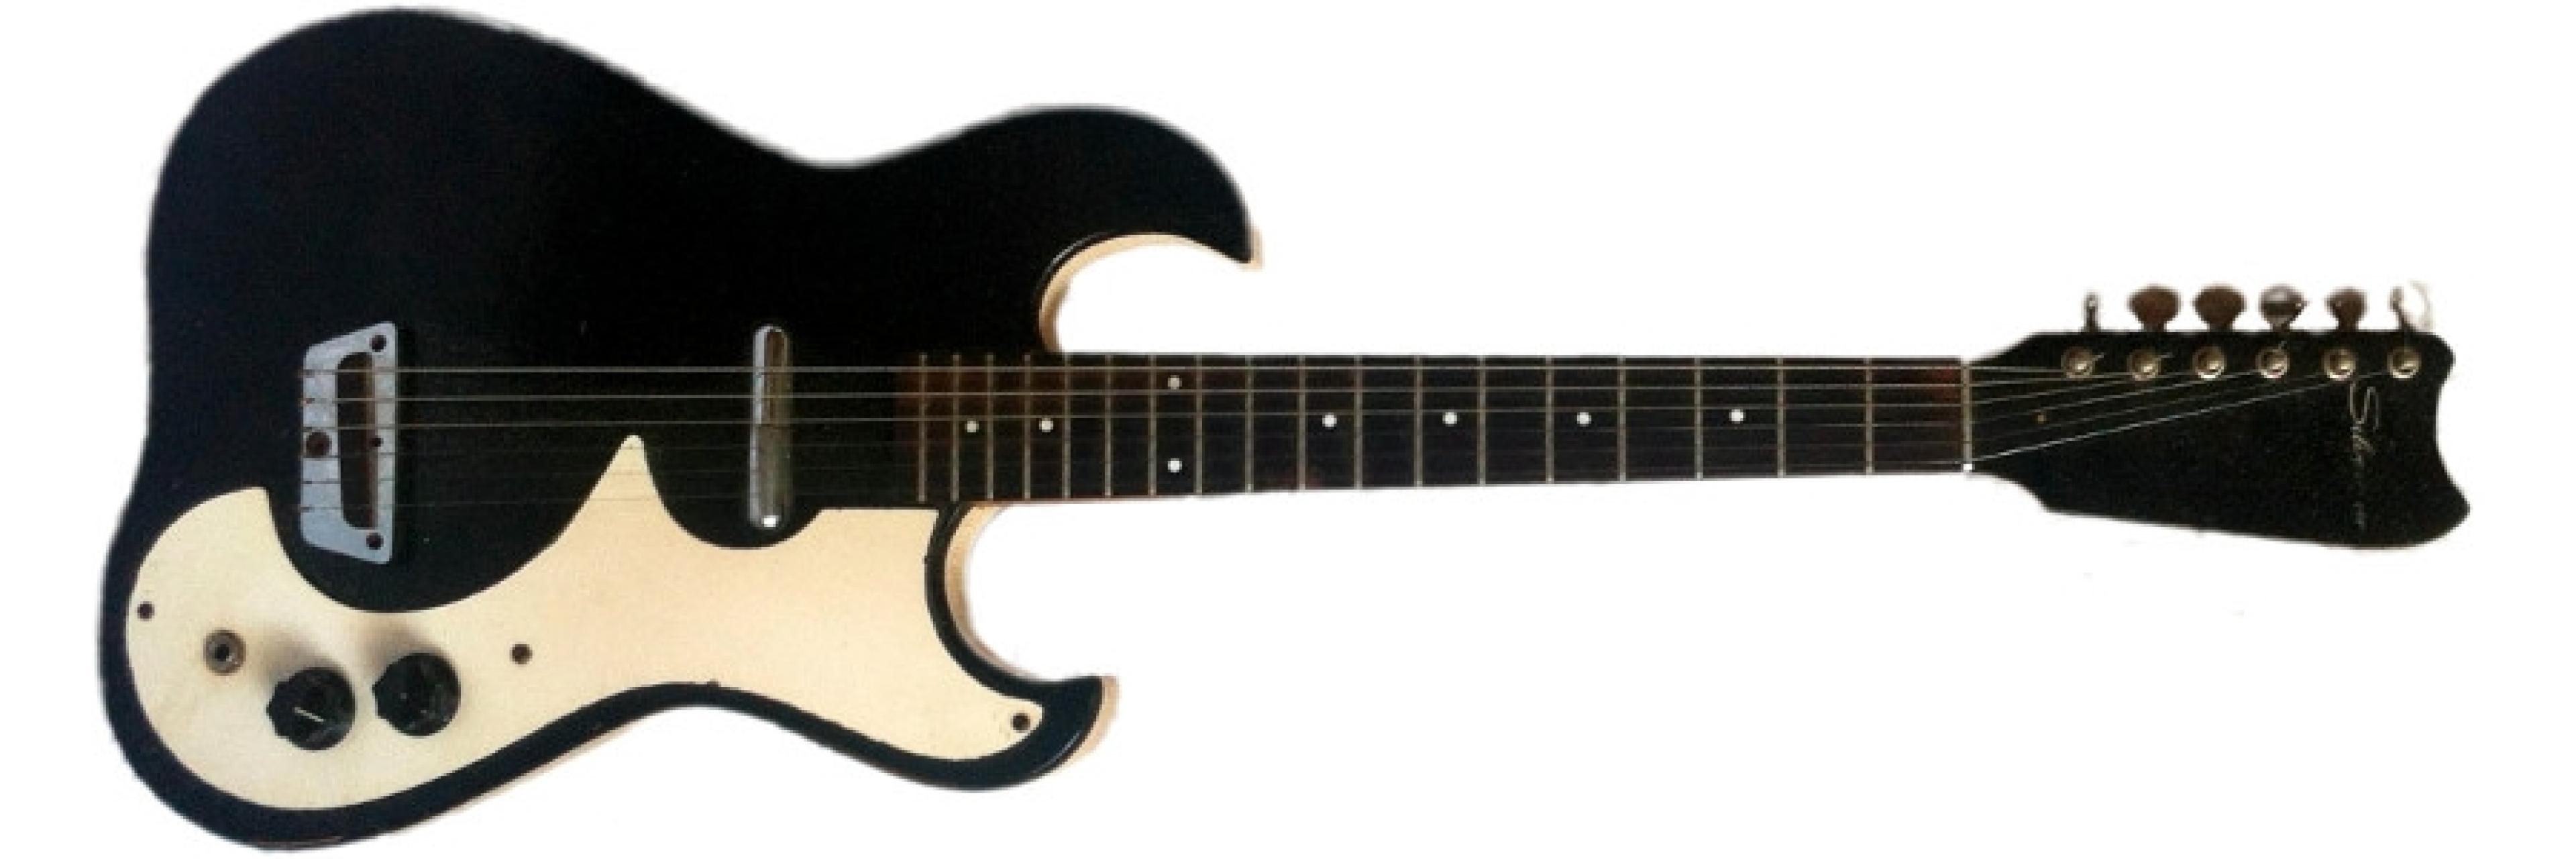 Silvertone 1448 guitar